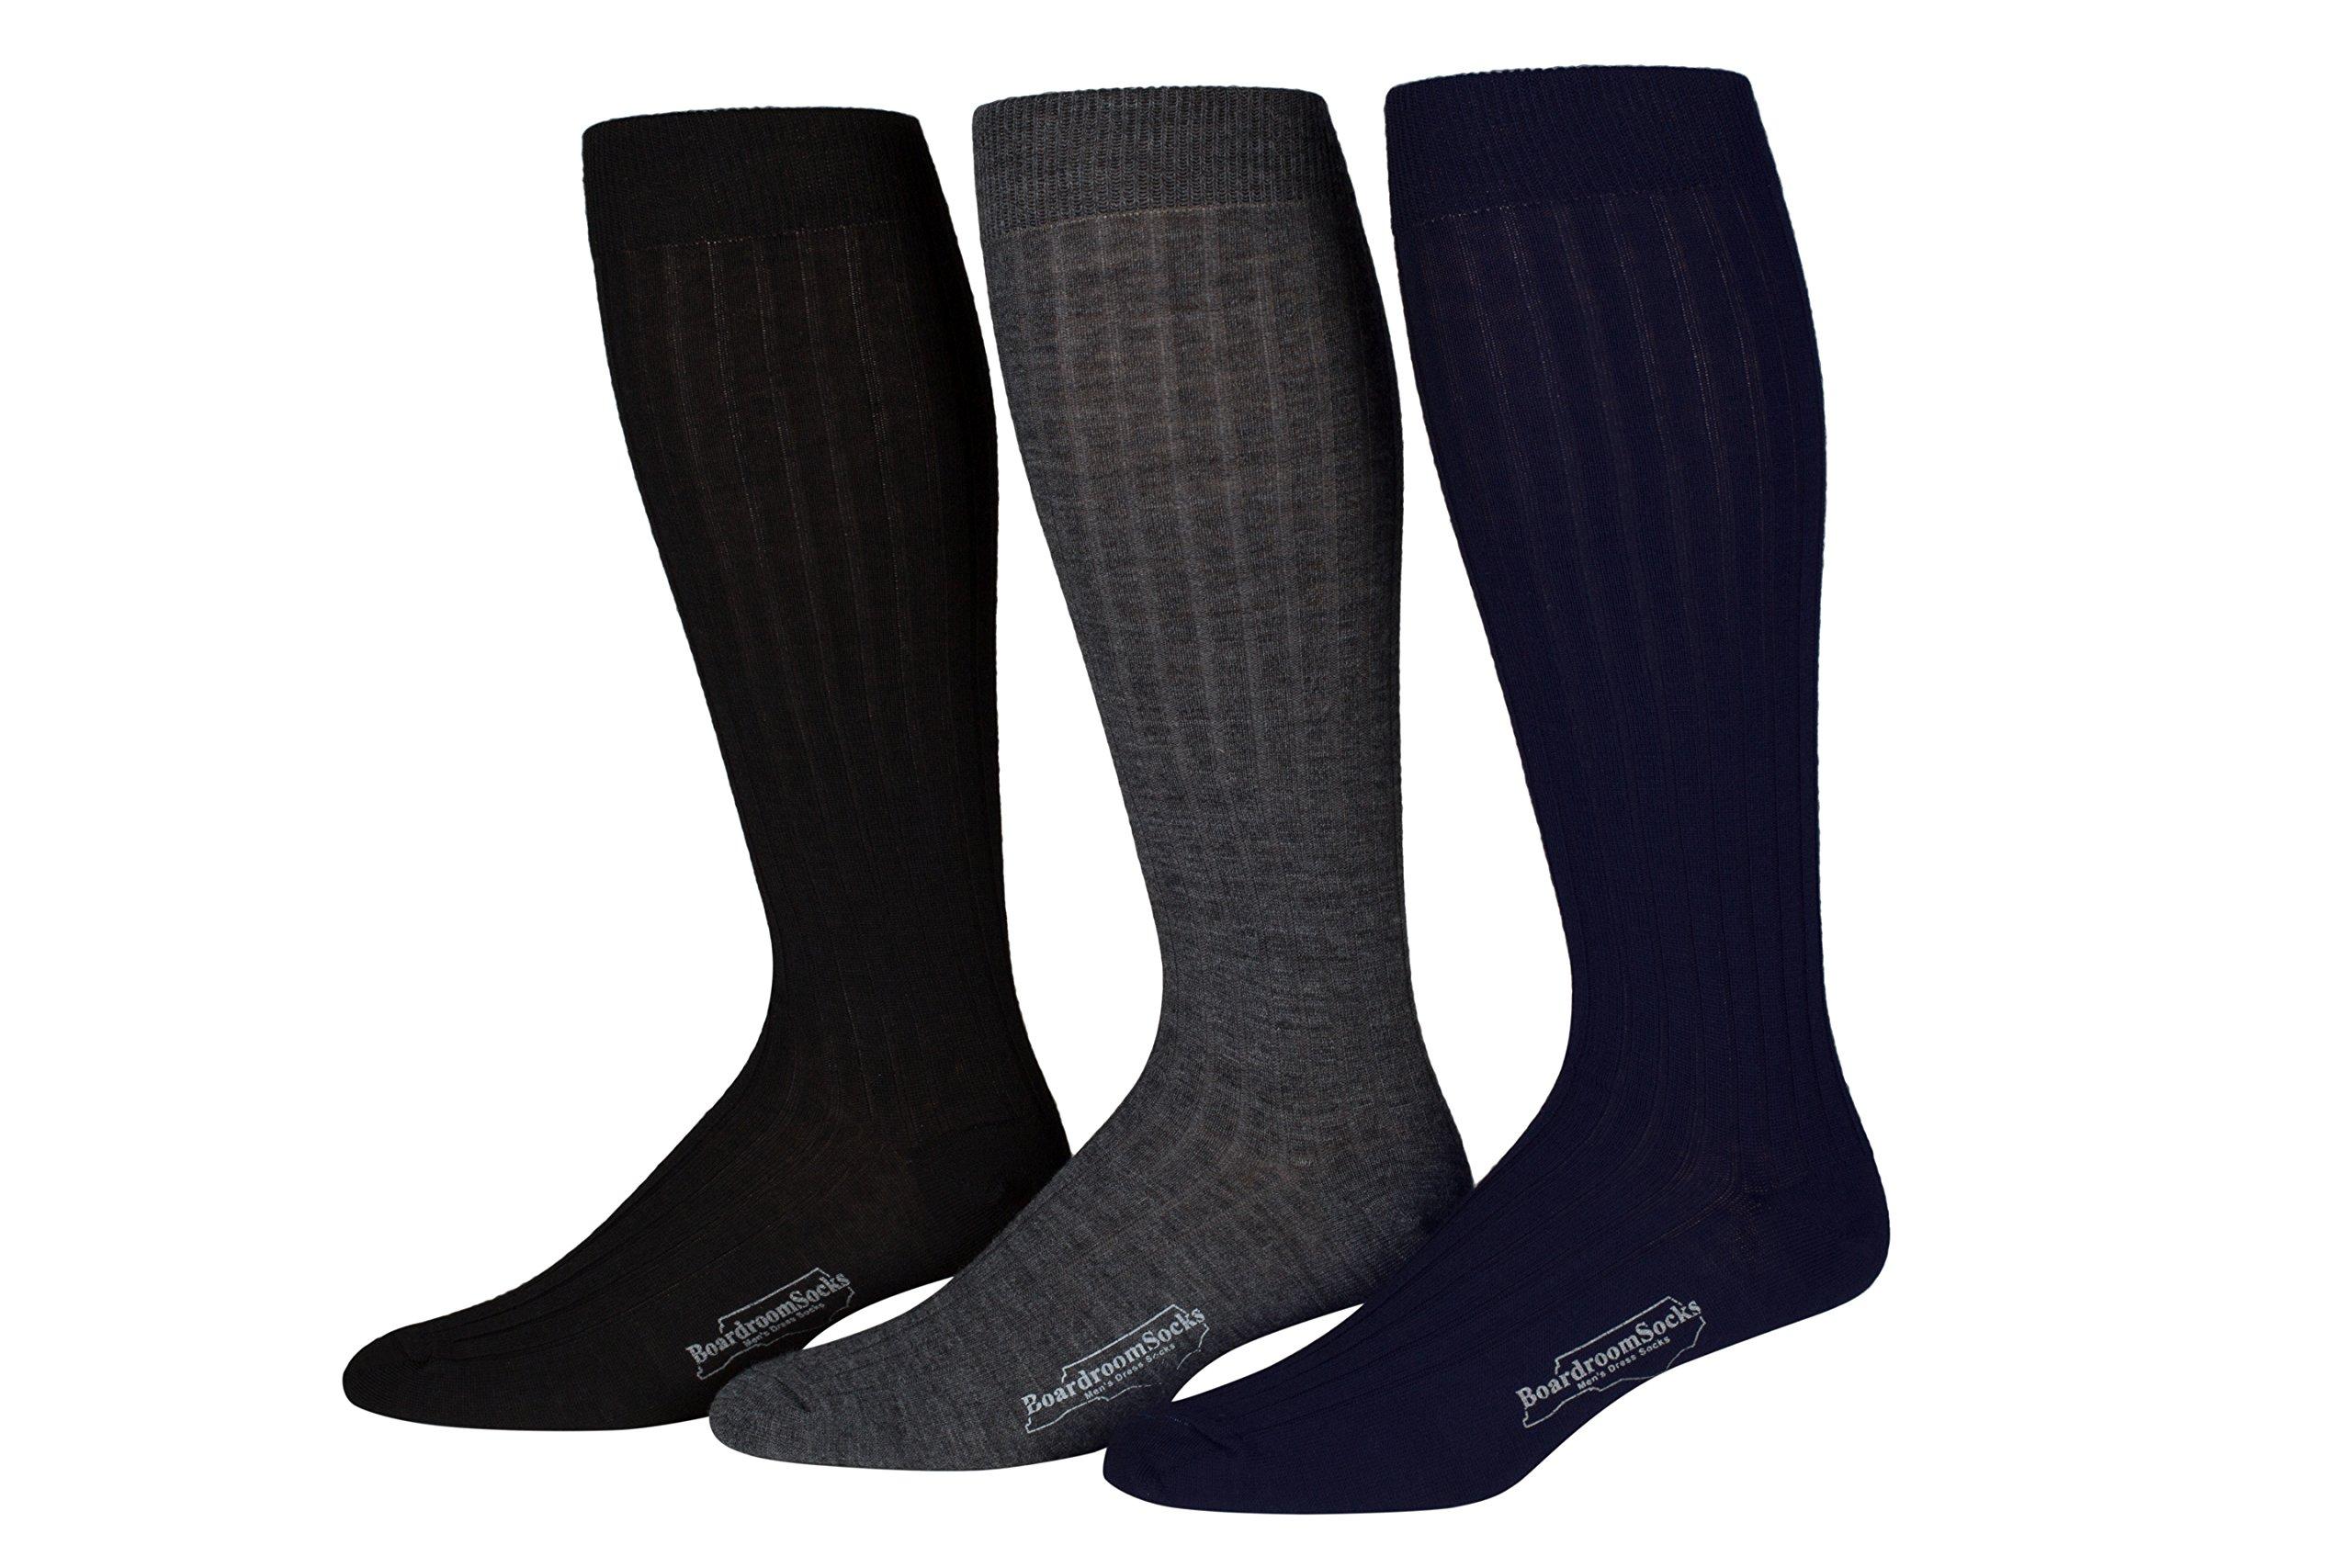 Boardroom Socks Men's Over the Calf Merino Wool Ribbed Dress Socks 3 Pack